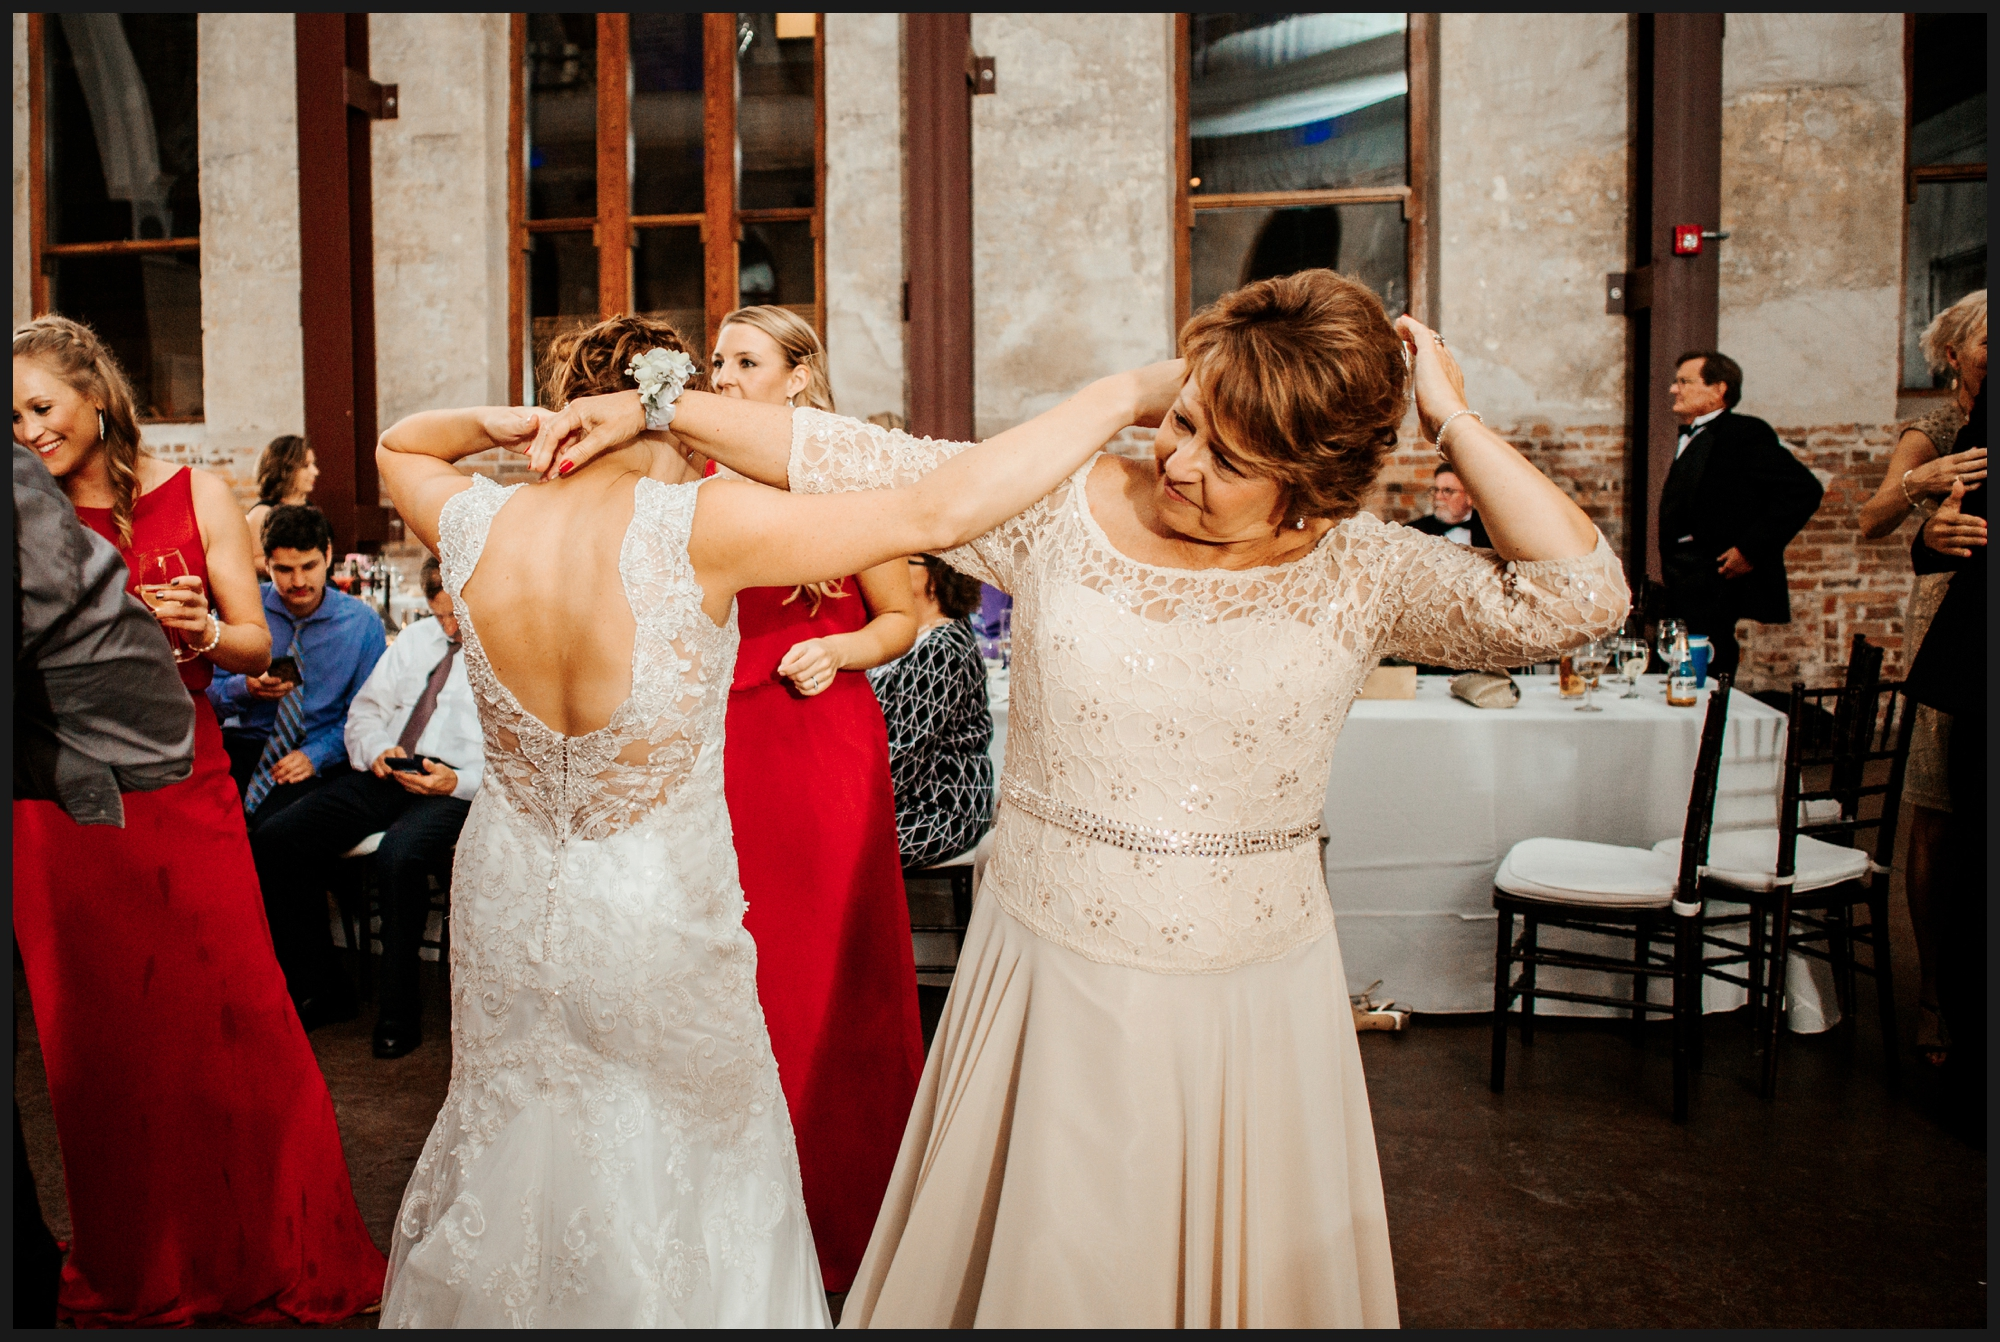 Orlando-Wedding-Photographer-destination-wedding-photographer-florida-wedding-photographer-bohemian-wedding-photographer_0662.jpg